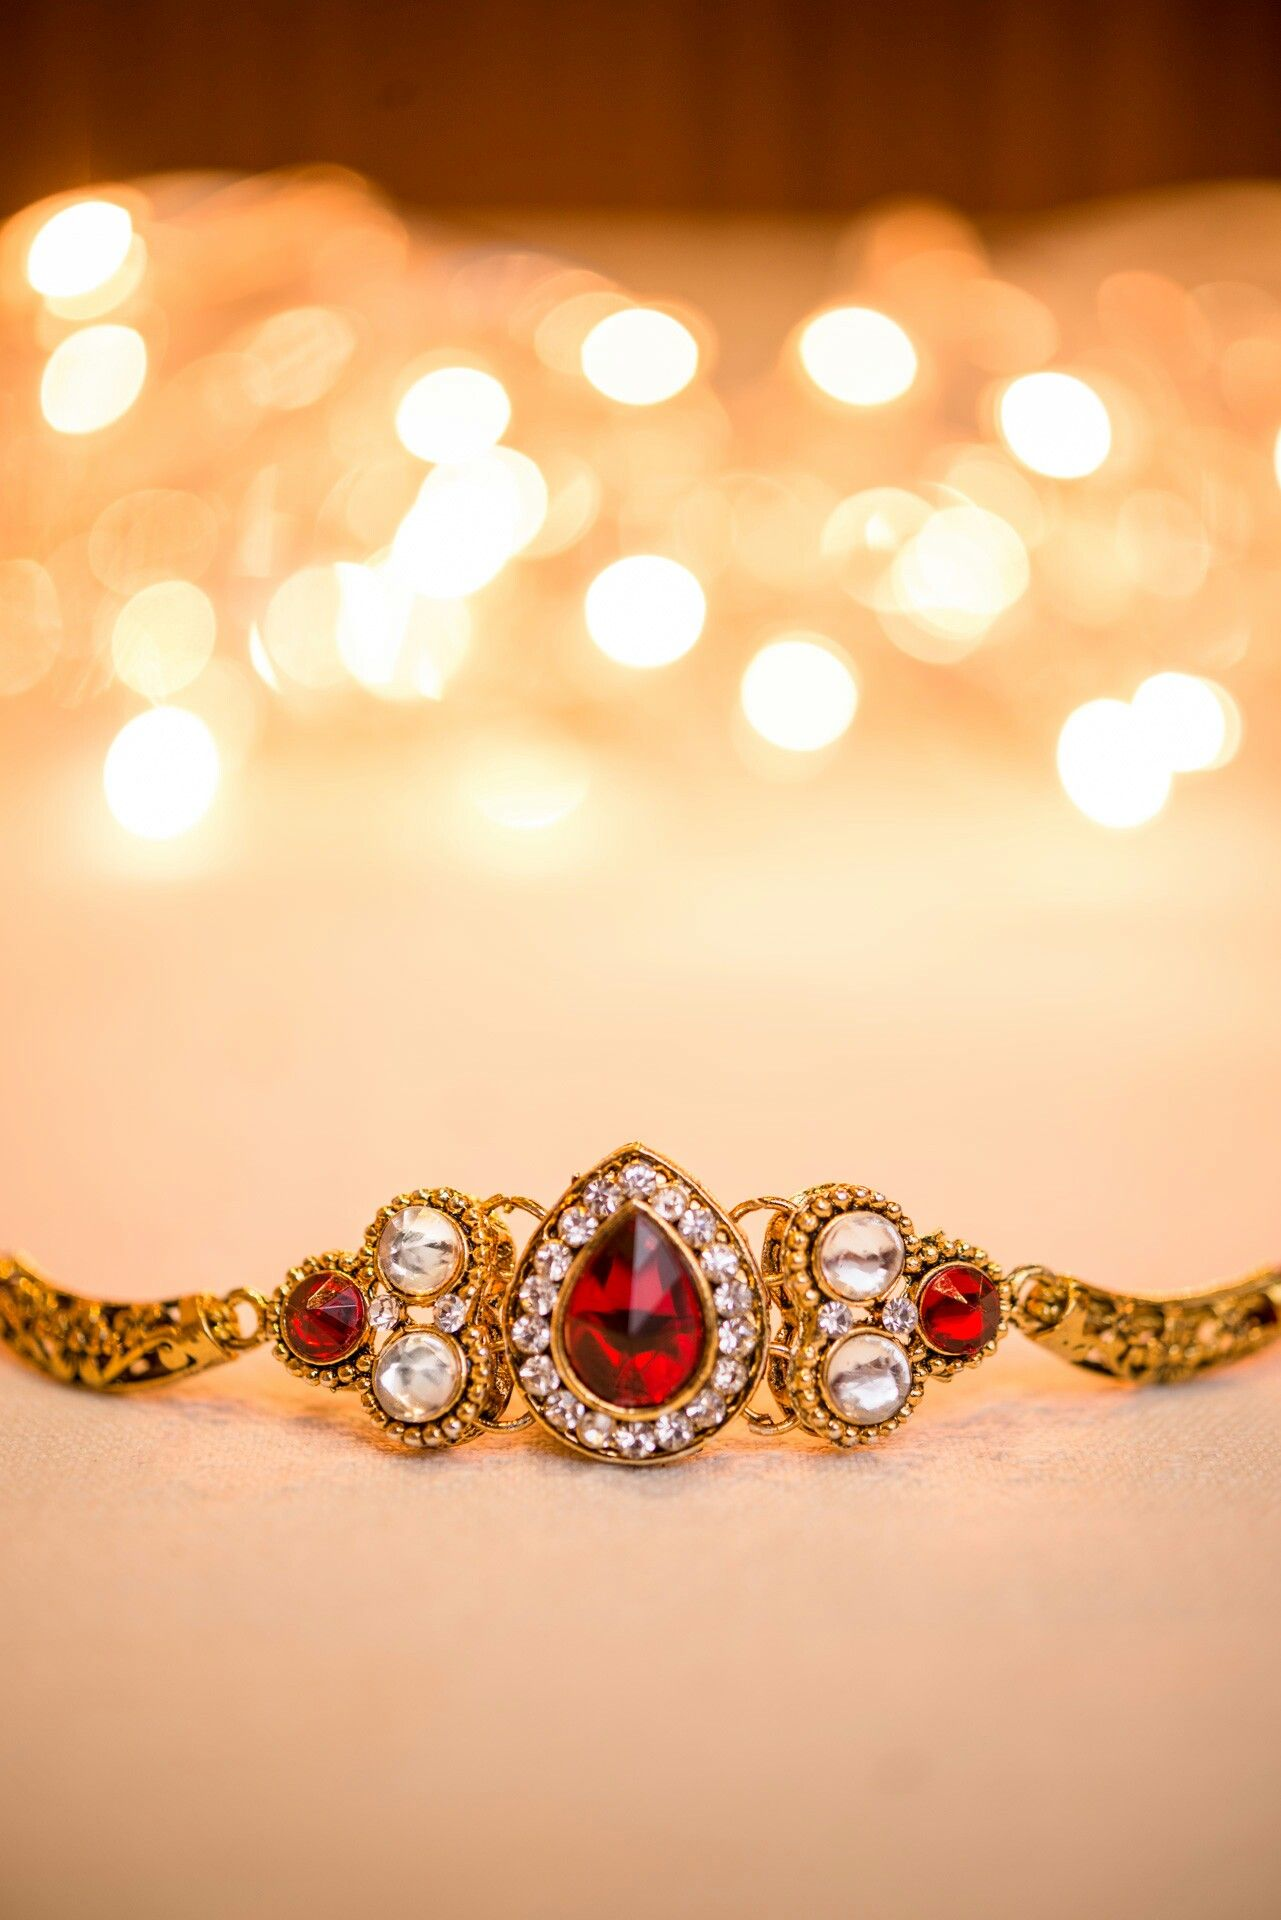 #UPAHÃRA #RAKHI COLLECTION #Royalé Send Rakhi worldwide. Buy now from our website. Link in bio! #rakhi #rakshabandhan #rakhifestival #rakhicollection #rakhigifts #giftforbrother #roli #tika #sweets #mithai #kuchmithahojaye #rakhdi #bhaii #bhai #bhaibehen #bhaiya #threadrakhi #rakhi2016 #bhabhirakhi #kidsrakhi #rakhiday #bhaibehenkapyaar #lumbarakhi #pearlrakhi #rakhithreads #swarovskirakhi  #goldplatedrakhi #Upahara #RakhiCollection #Rakhi2016 #brothersister #RakhiDay #RakhiGifts #bhai…